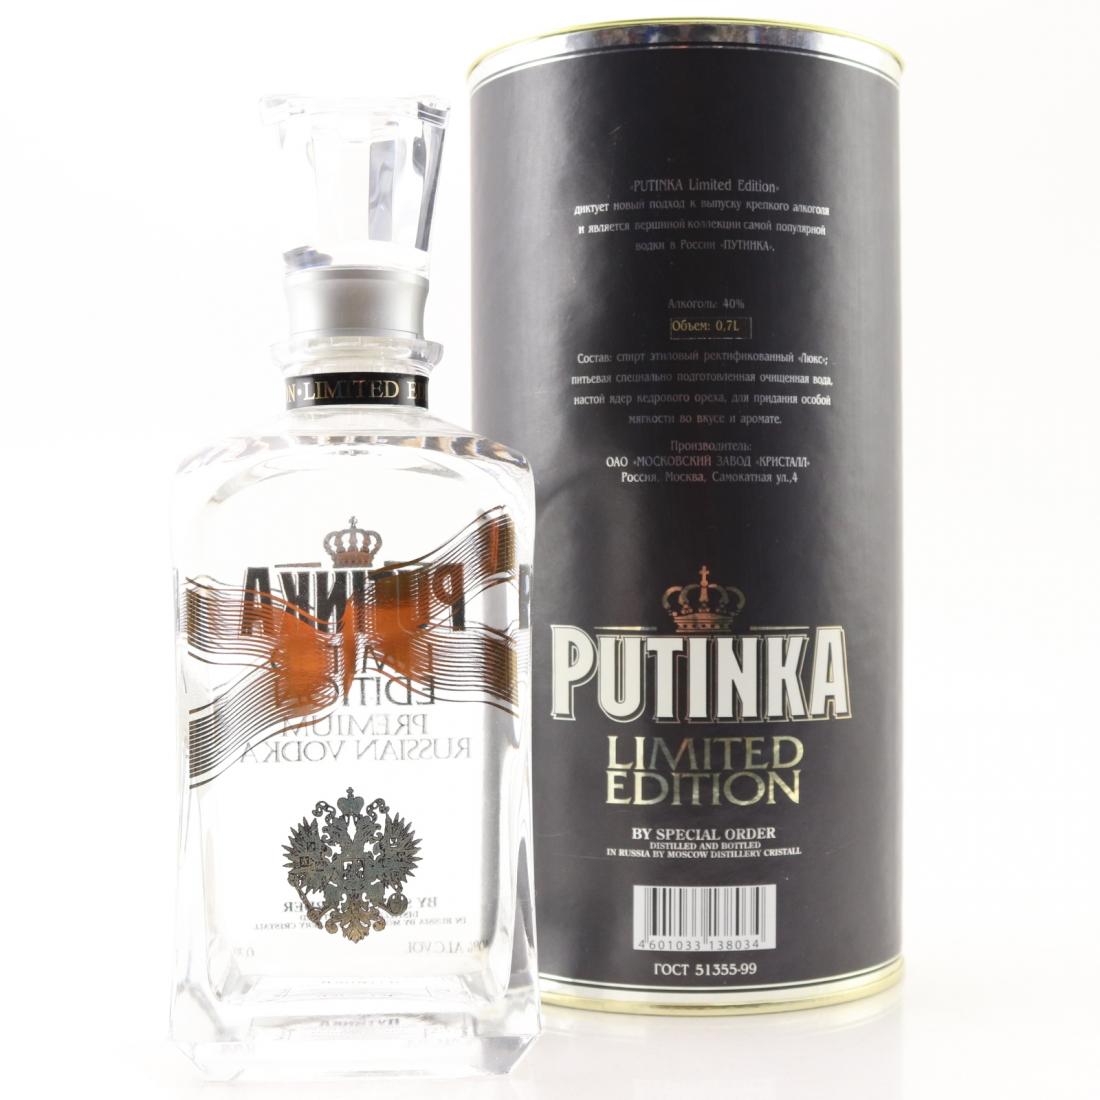 Putinka Limited Edition Russian Vodka